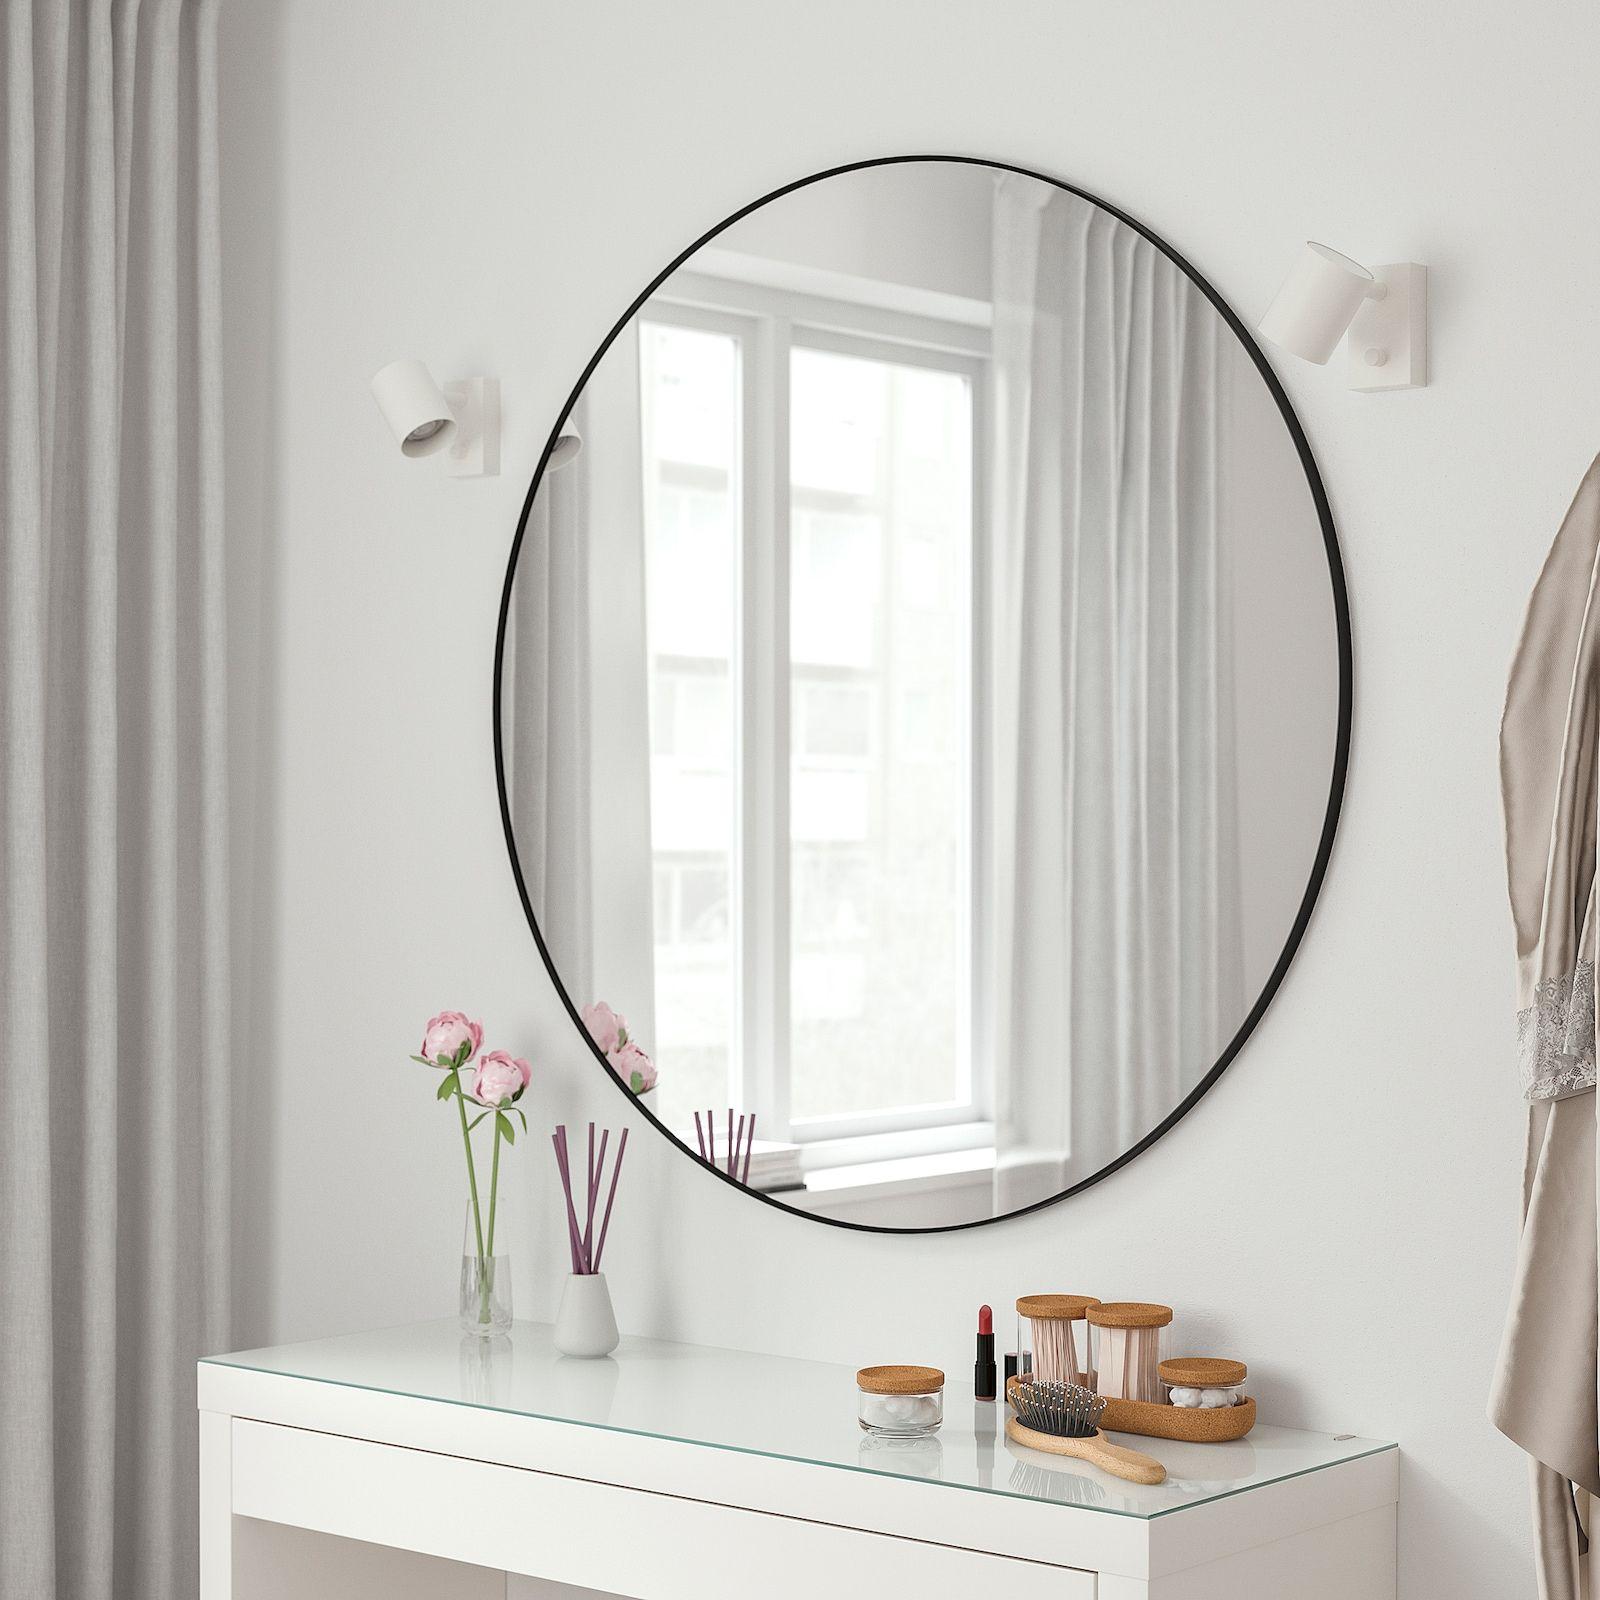 LINDBYN Miroir - noir - IKEA in 3  Round mirror bathroom